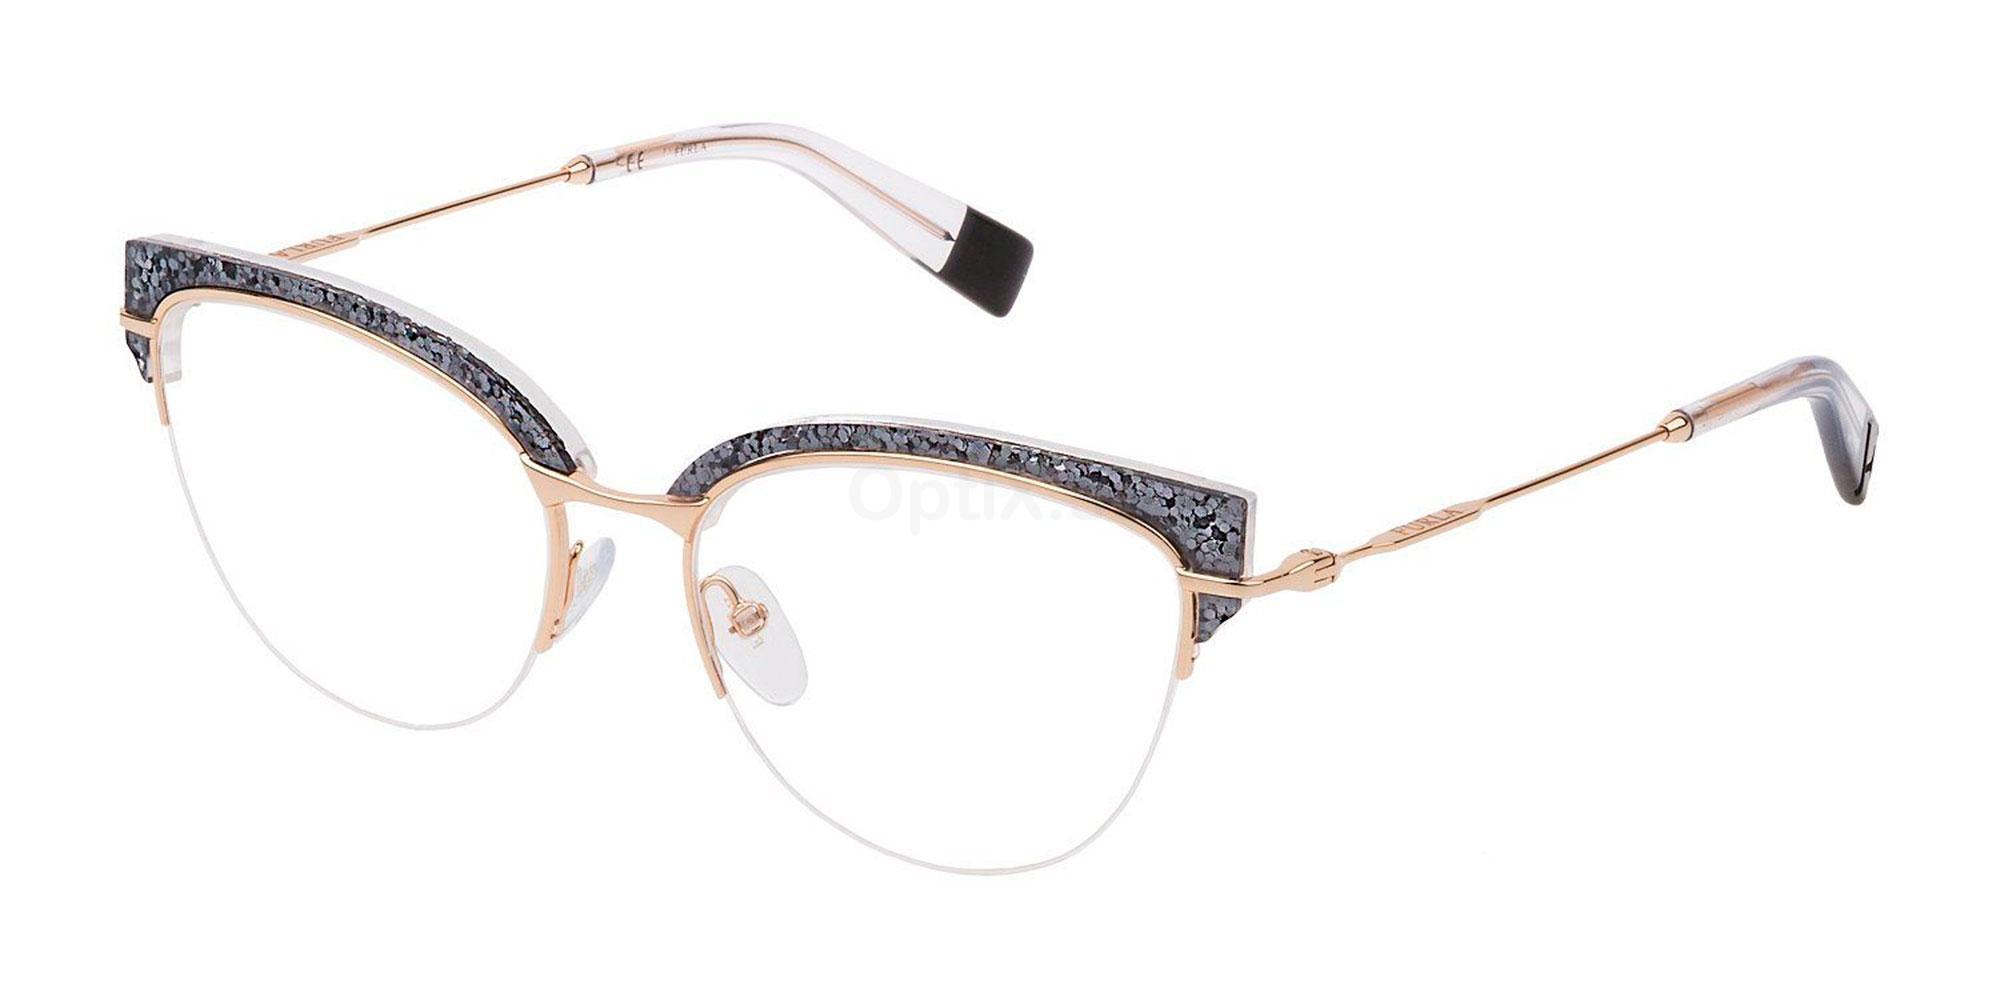 0300 VFU304 Glasses, Furla